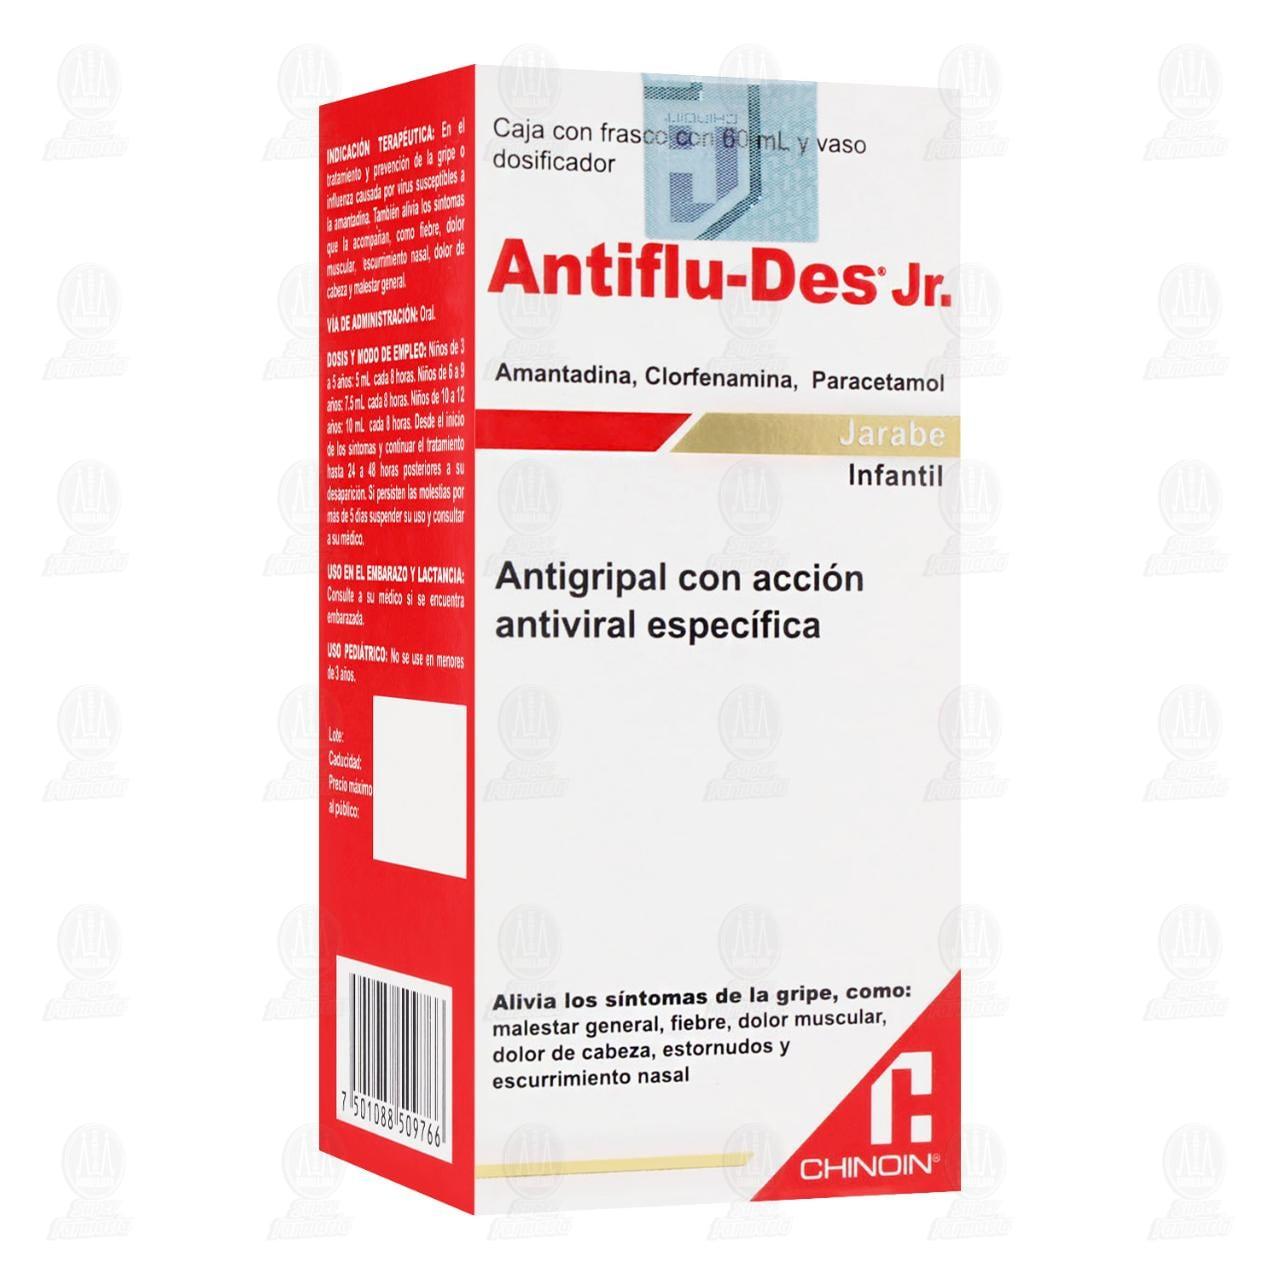 Comprar Antiflu-Des Jr. Jarabe Infantil 60ml en Farmacias Guadalajara